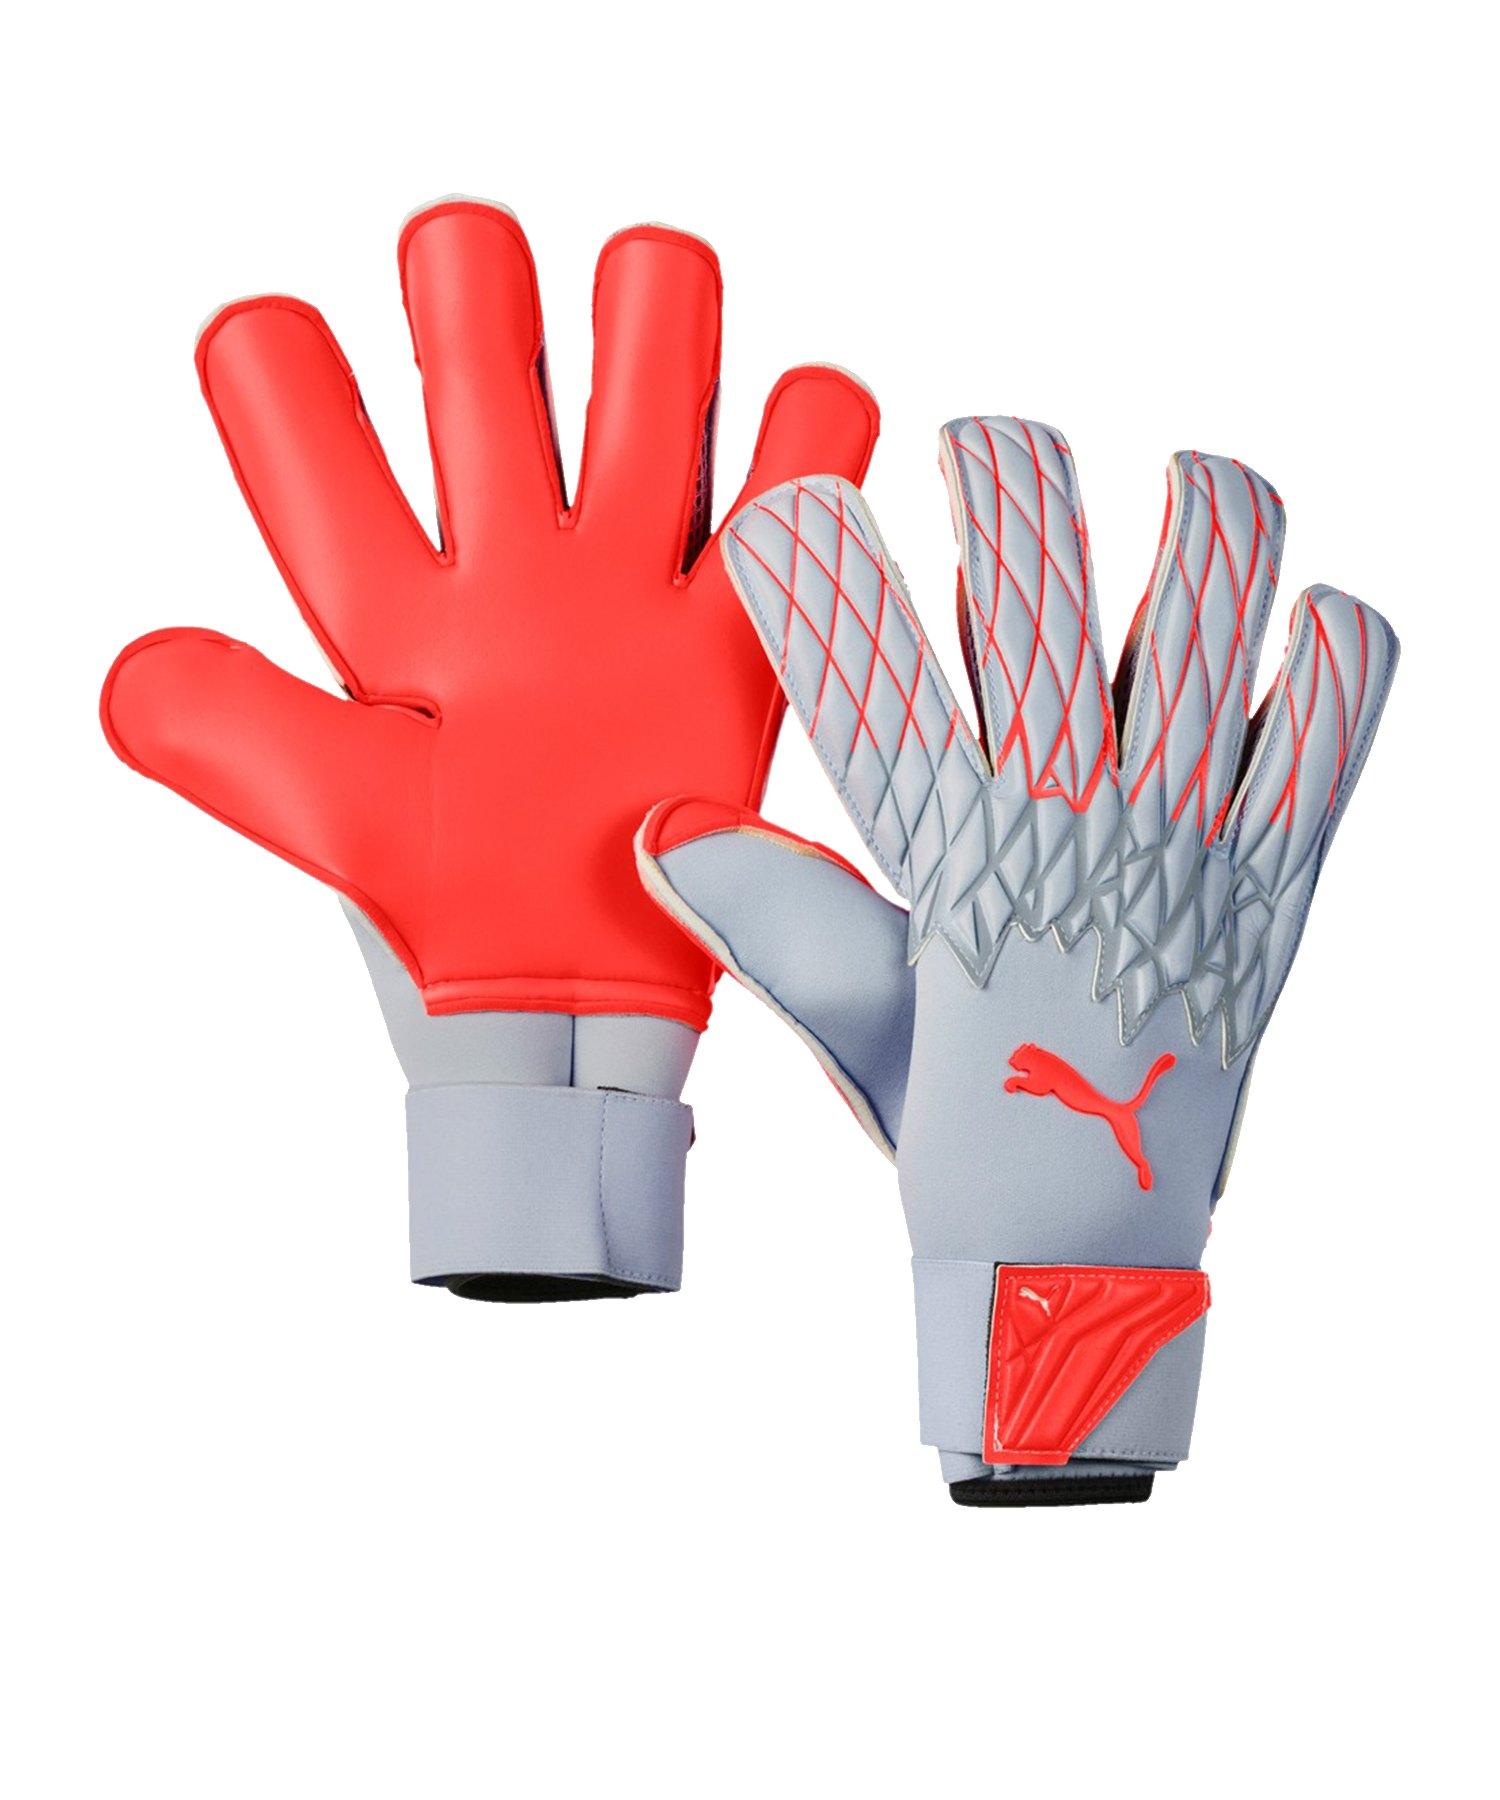 PUMA FUTURE Grip 19.2 TW-Handschuh Grau Rot F01 - Grau